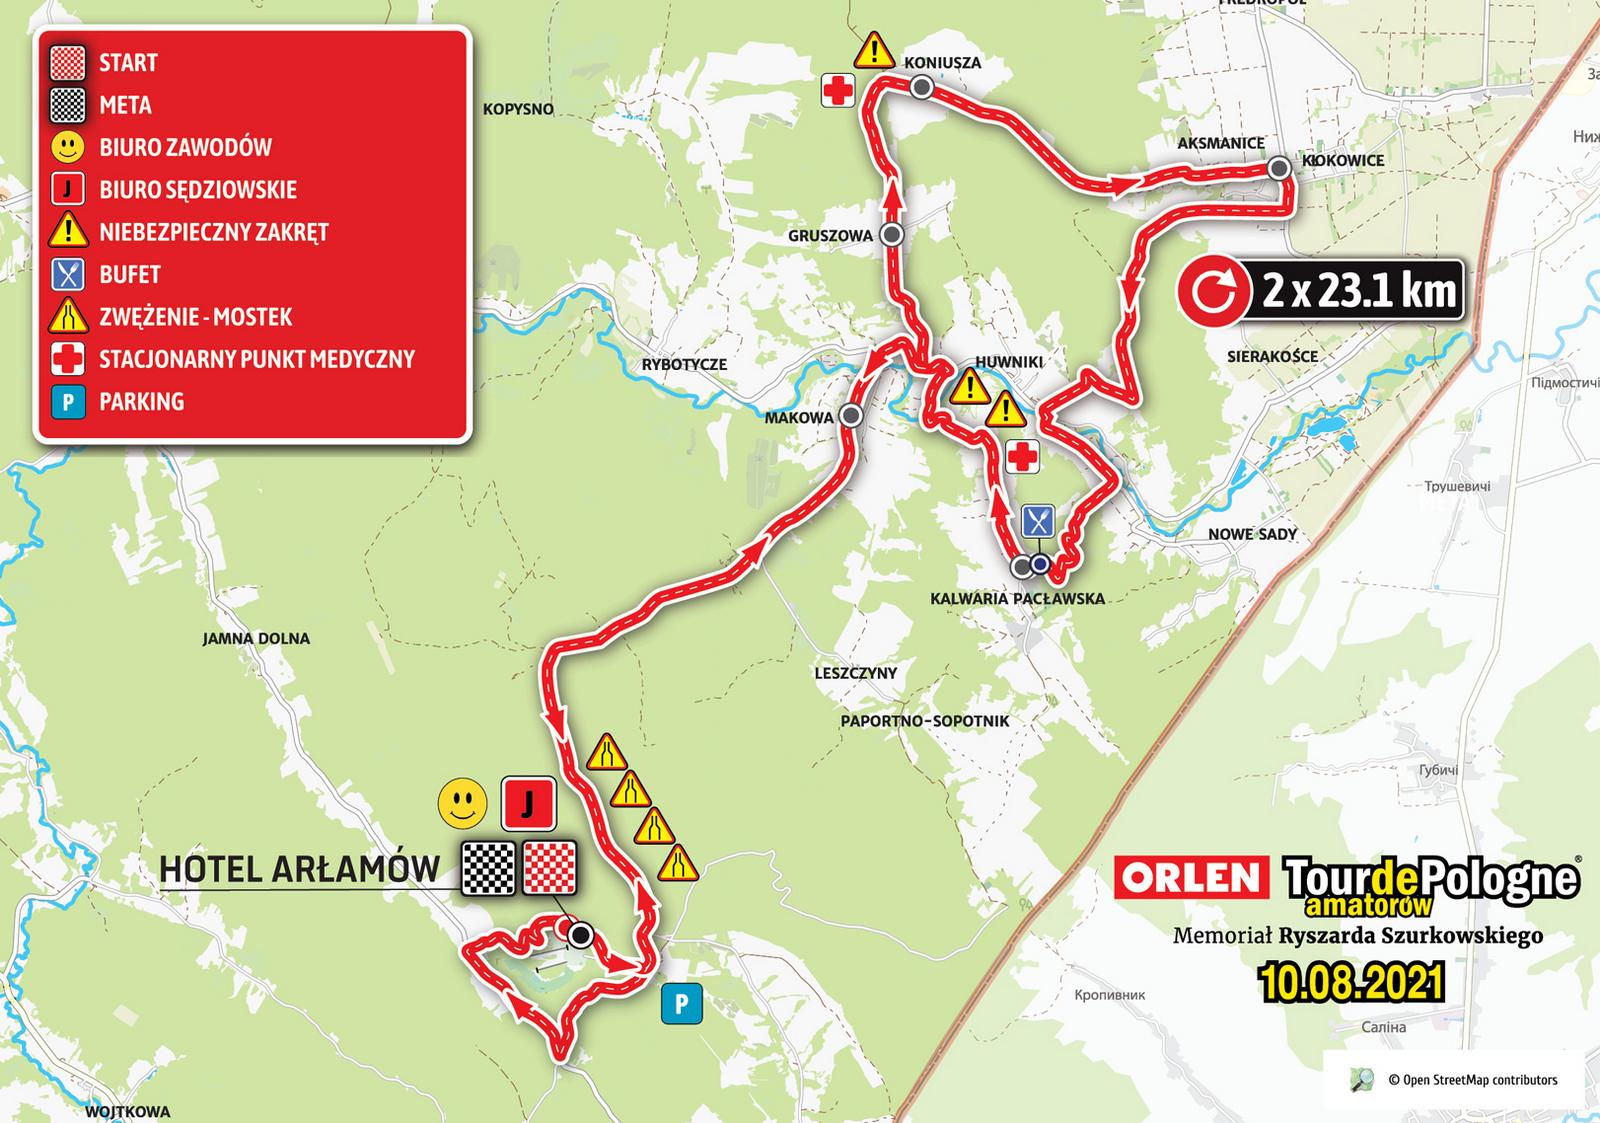 78. Tour de Pologne UCI World Tour: Z Lublina do Krakowa